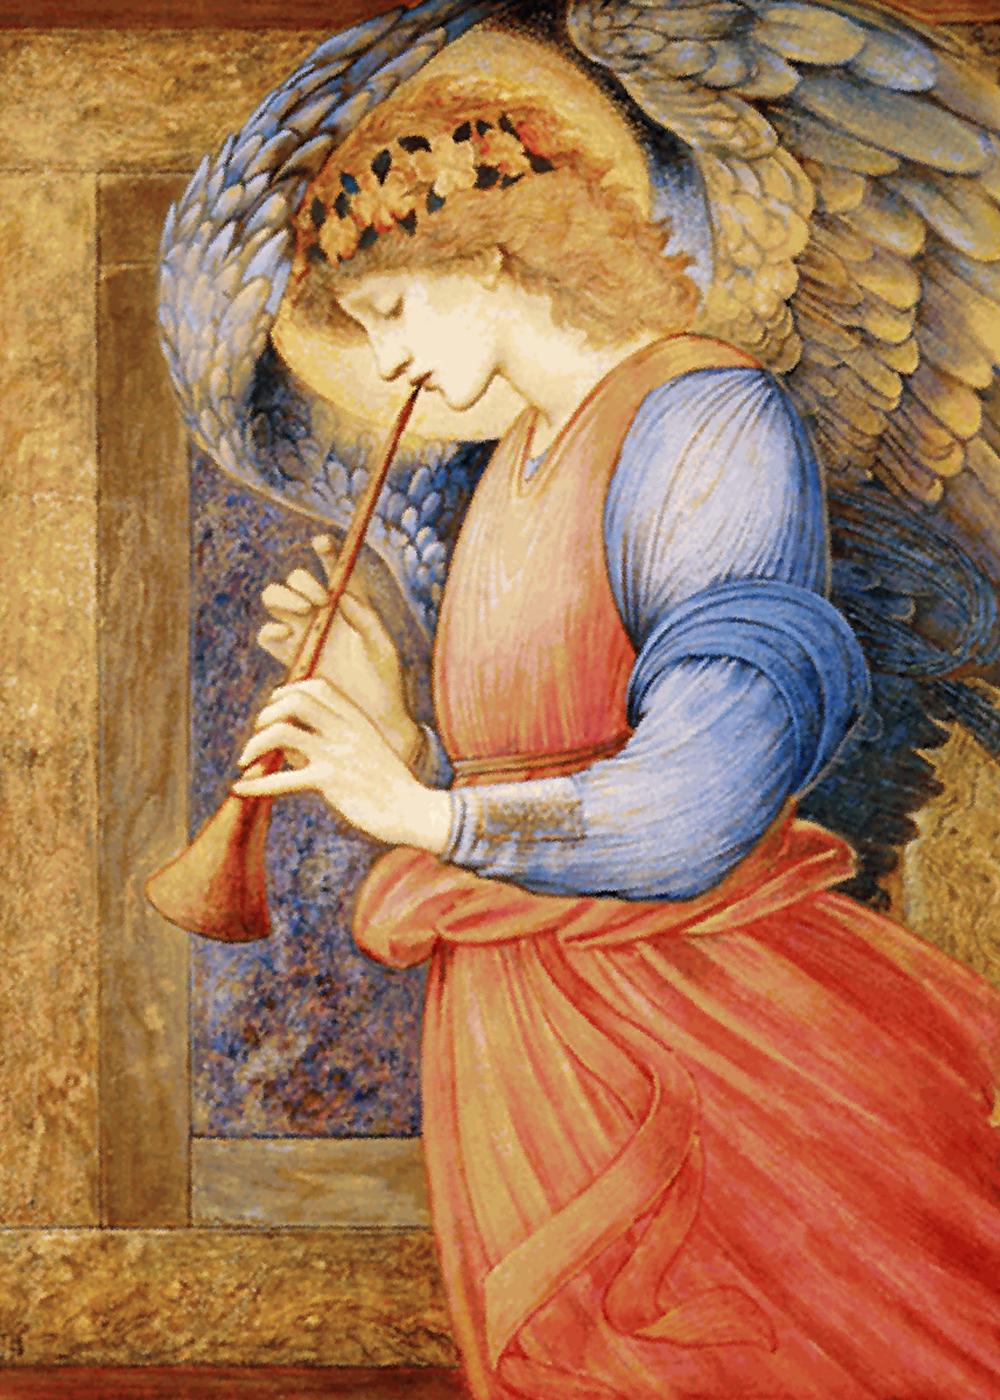 http://upload.wikimedia.org/wikipedia/commons/d/d4/Edward_Burne-Jones_-_An_Angel_Playing_a_Flageolet.jpg